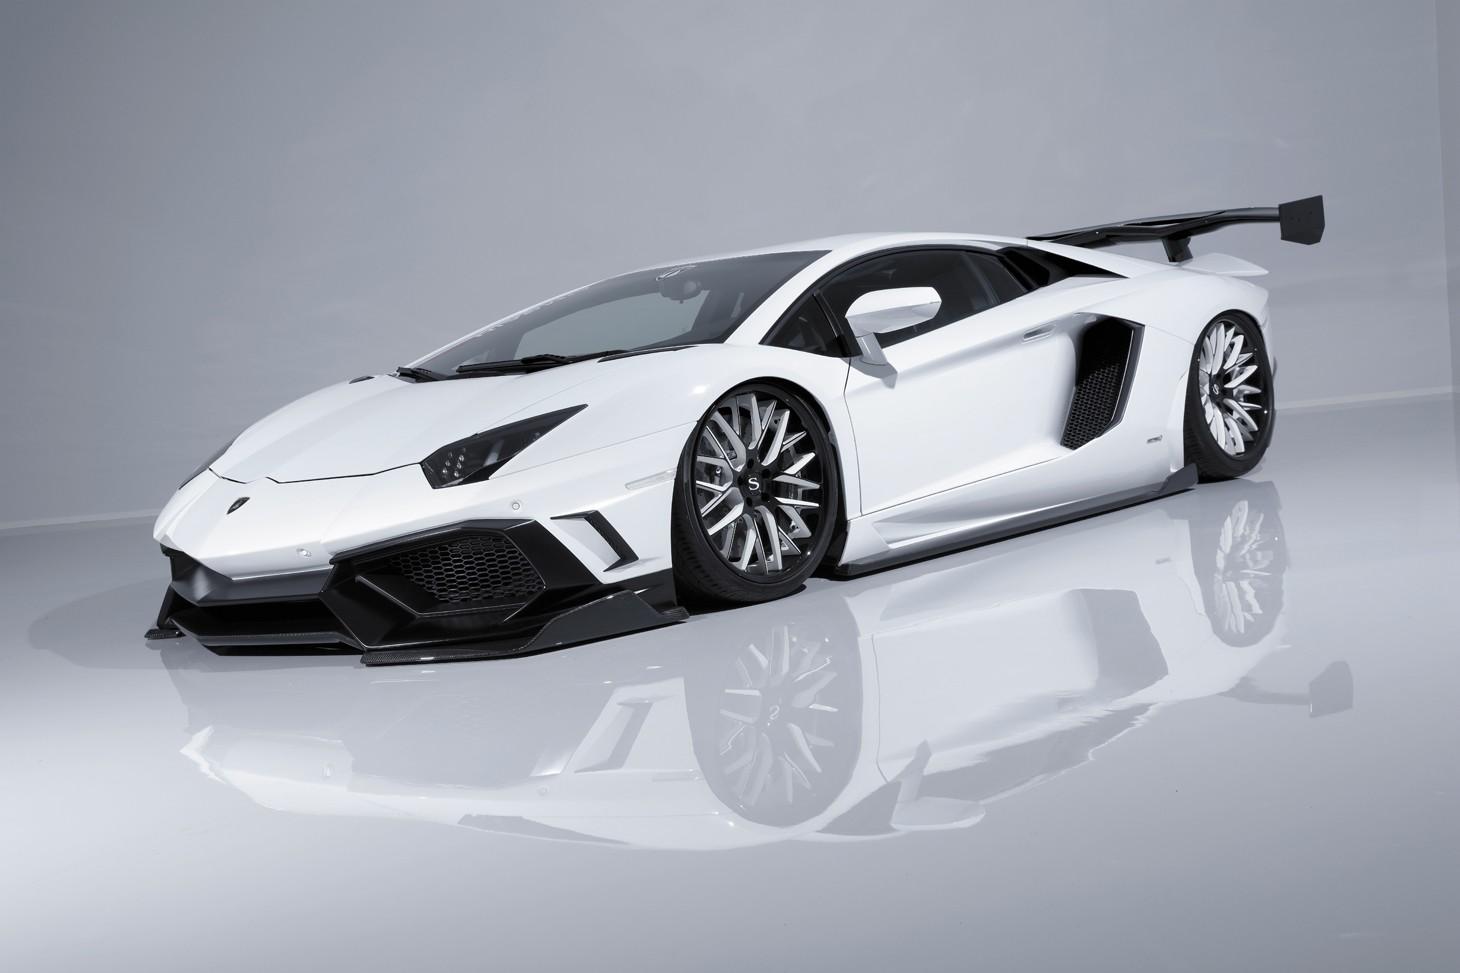 Rc Drift Cars Wallpaper Aimgain Gt Lamborghini Aventador Is From Japan Autoevolution